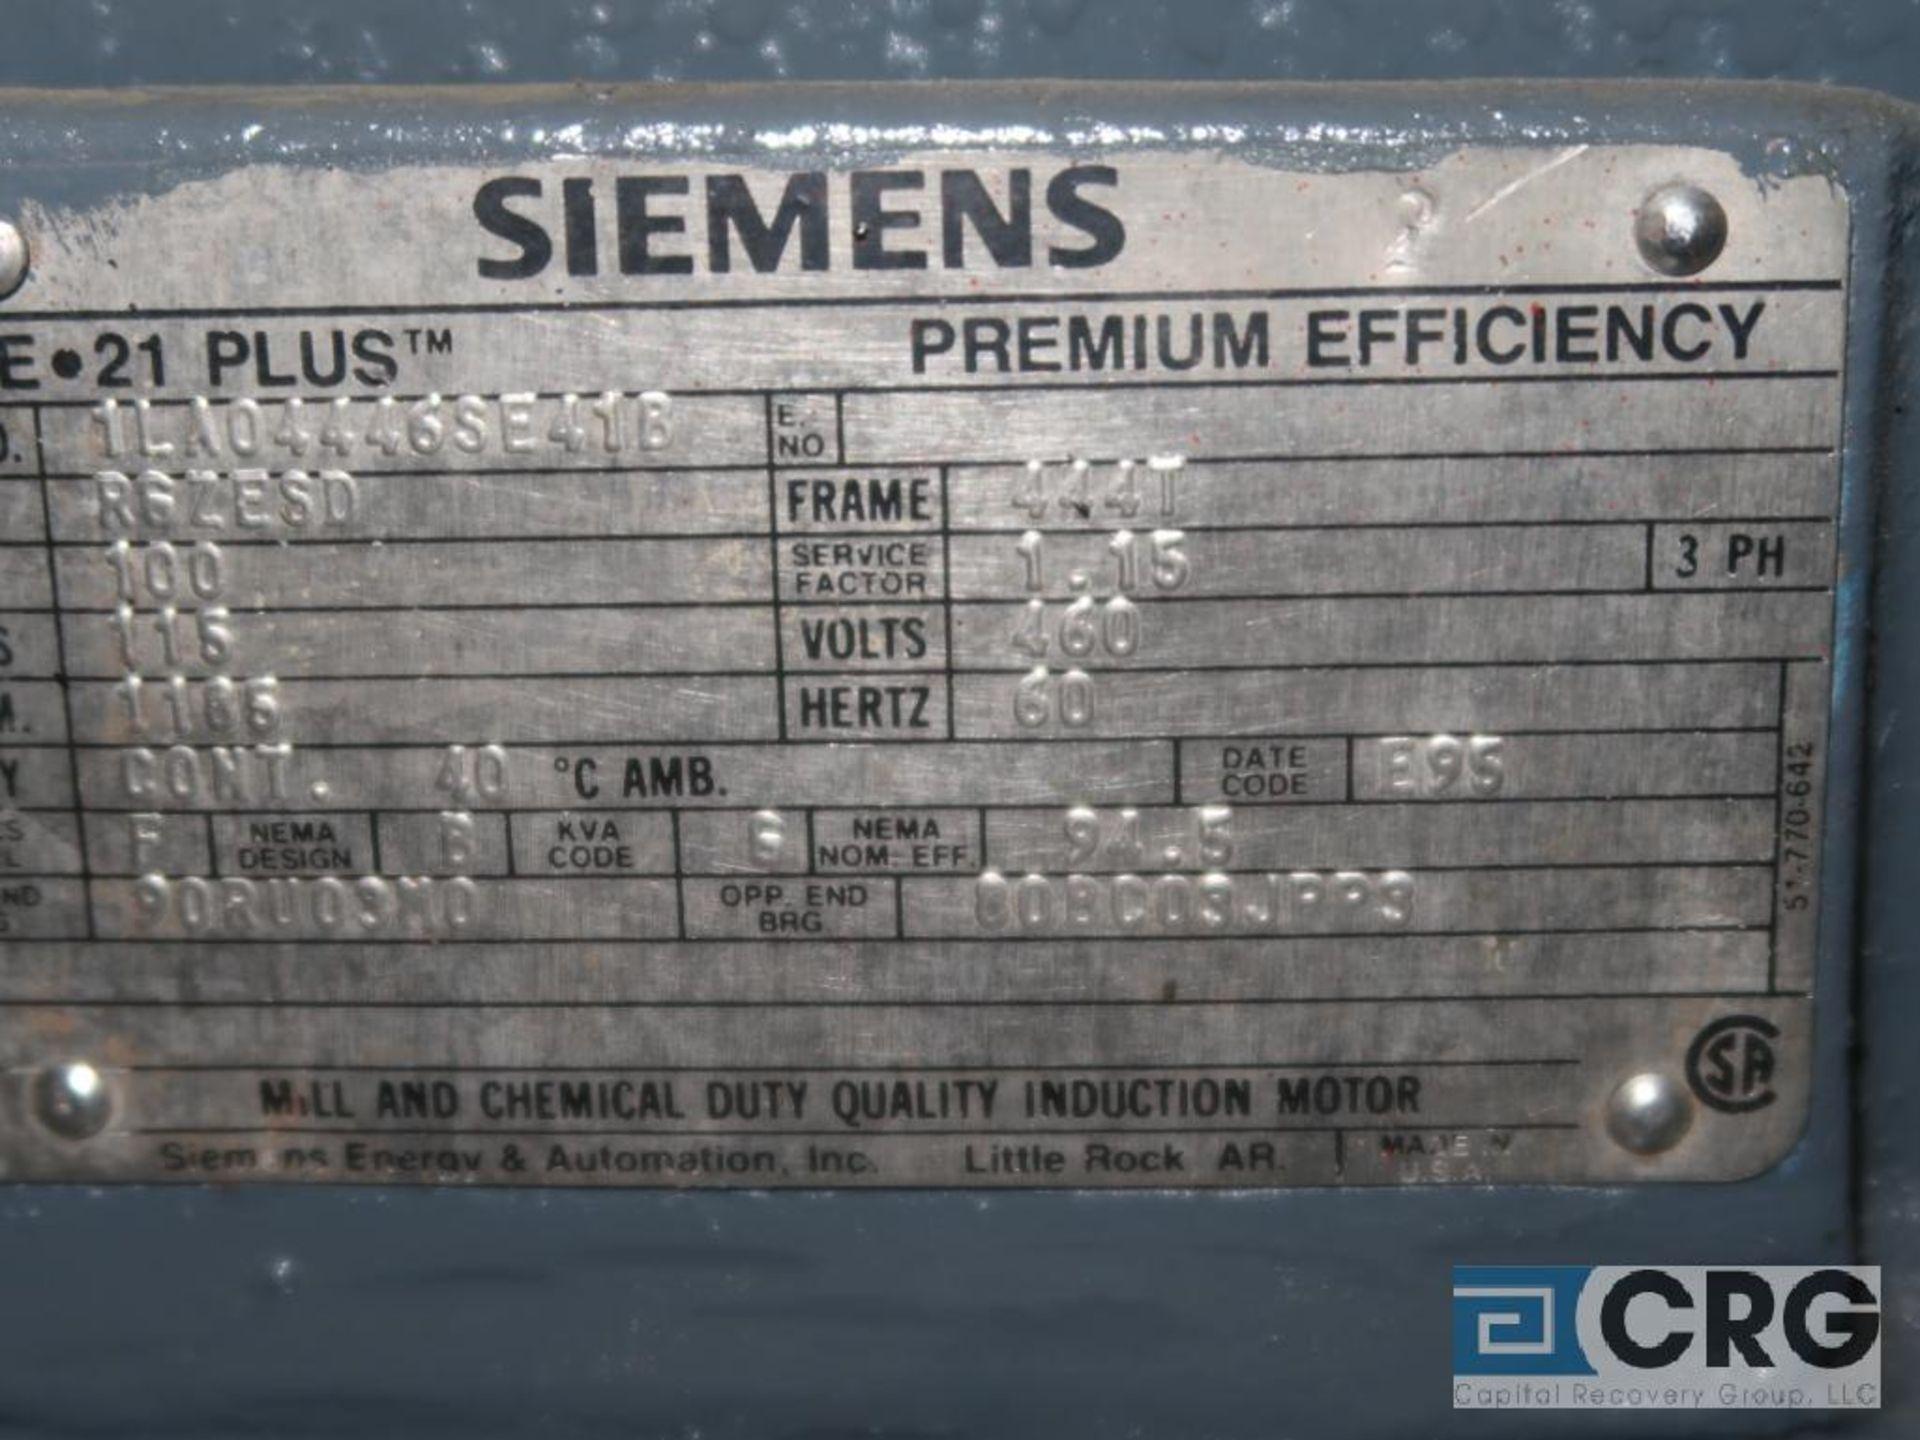 Siemens PE-21 PLUS motor, 100 HP, 1,185 RPMs, 460 volt, 3 ph., 444T frame (Finish Building) - Image 2 of 2